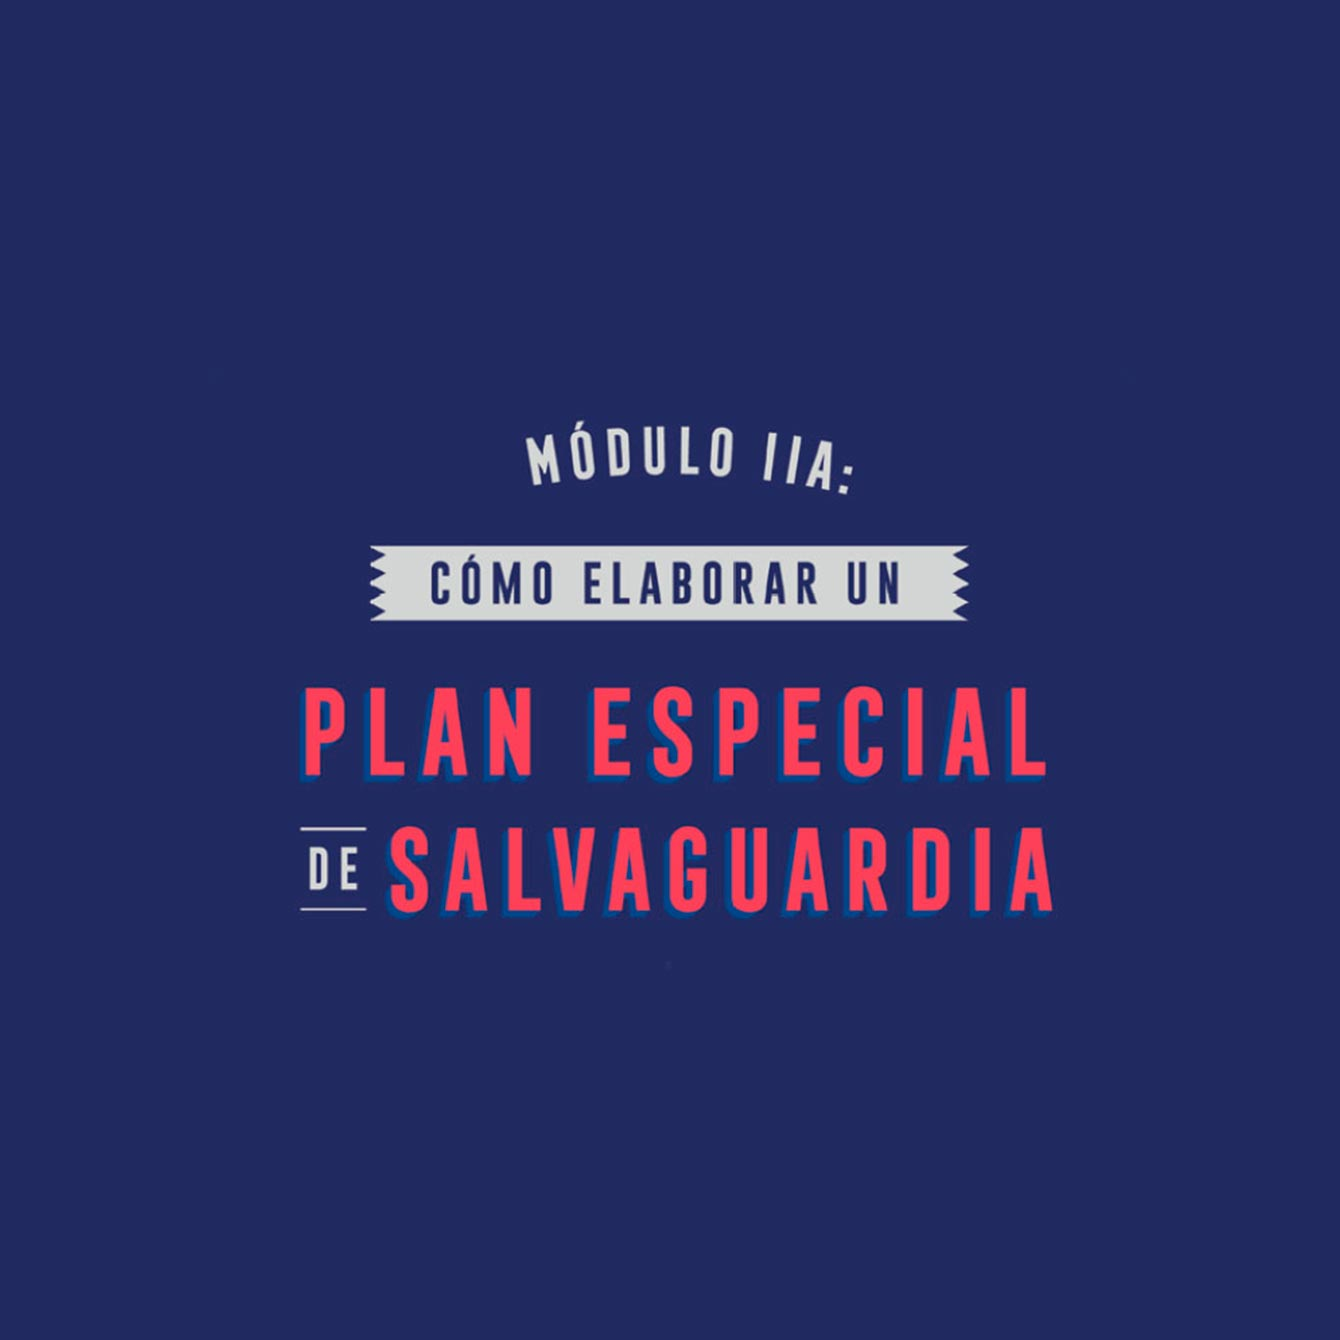 Plan Especial de Salvaguardia